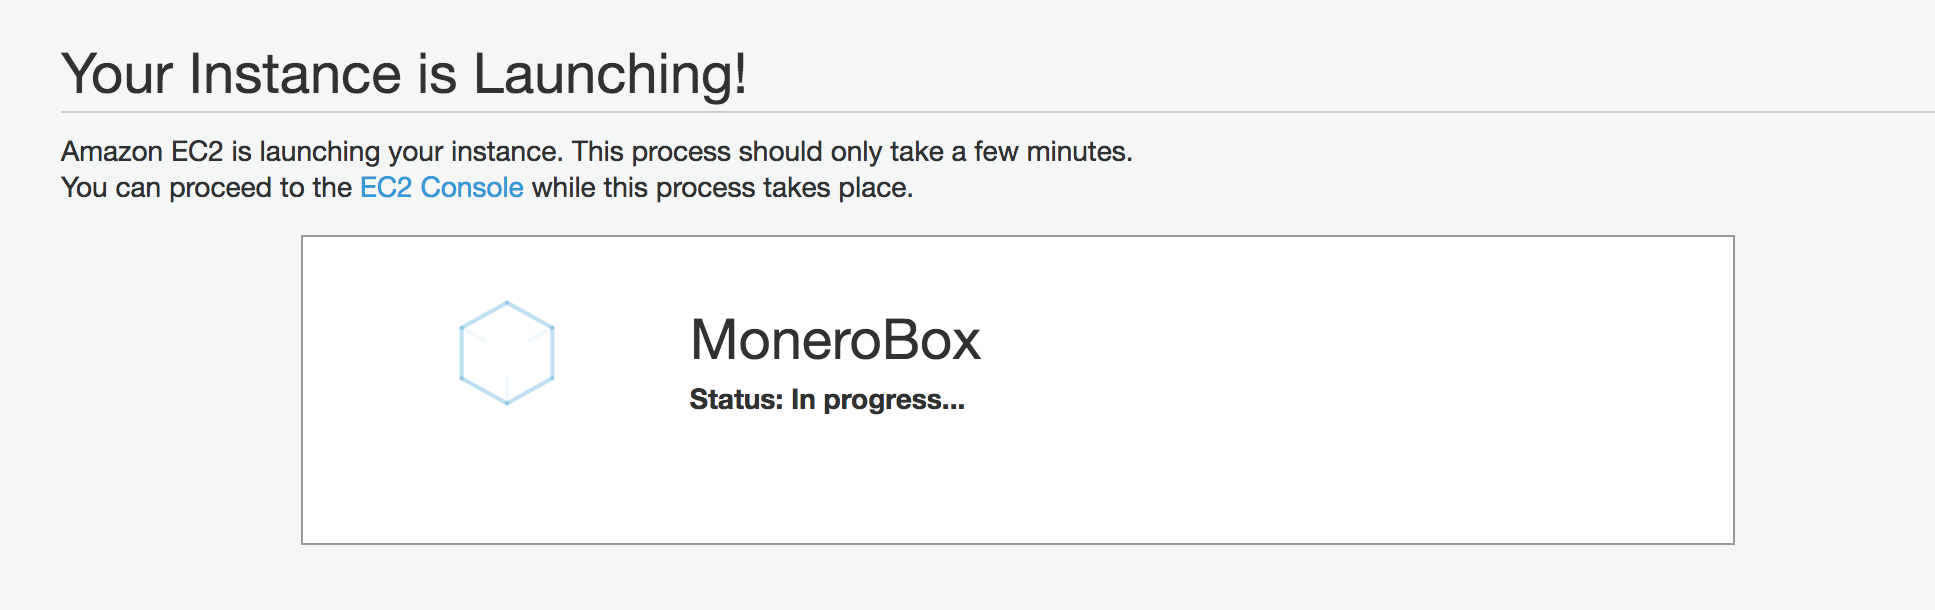 Provisioning your EC2 instance - this ones called MoneroBox